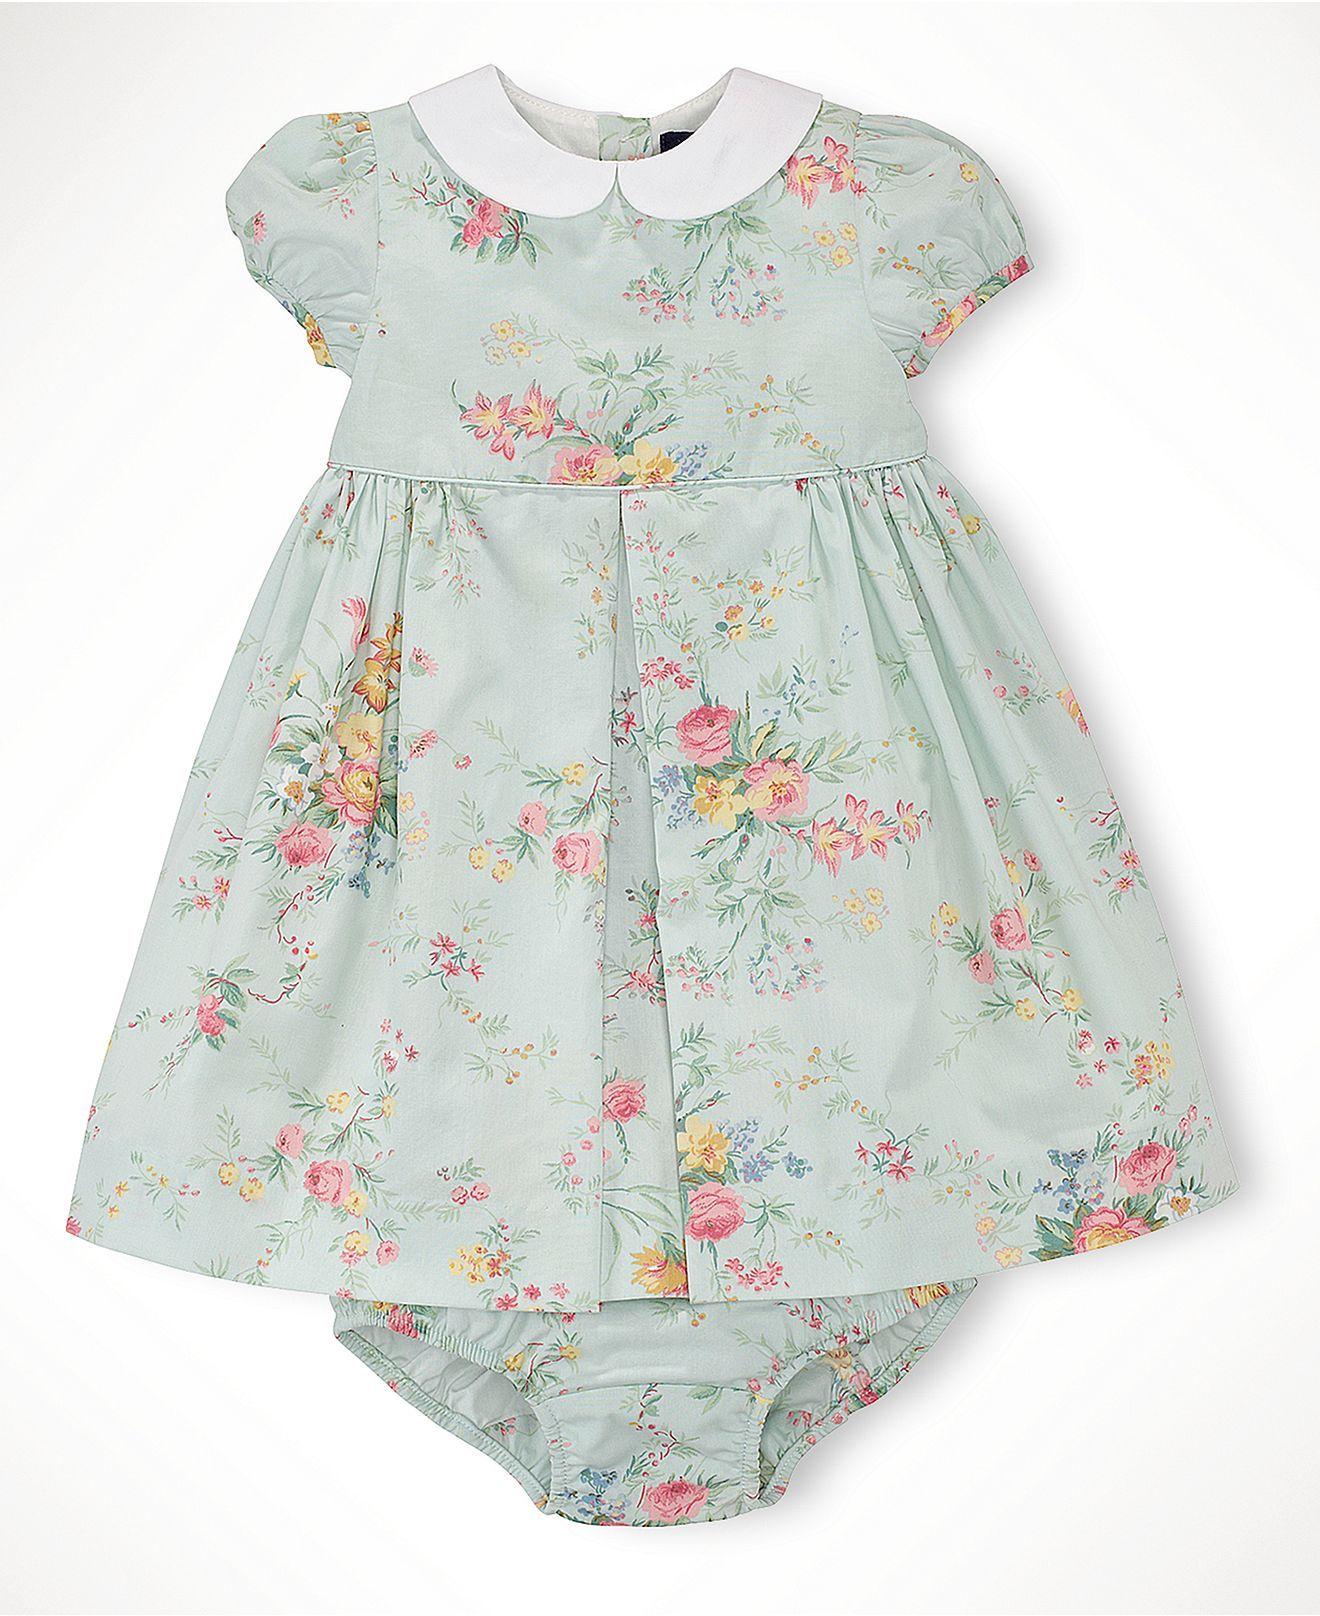 Easter Ralph Lauren Baby Girls Collared Spring Floral Dress